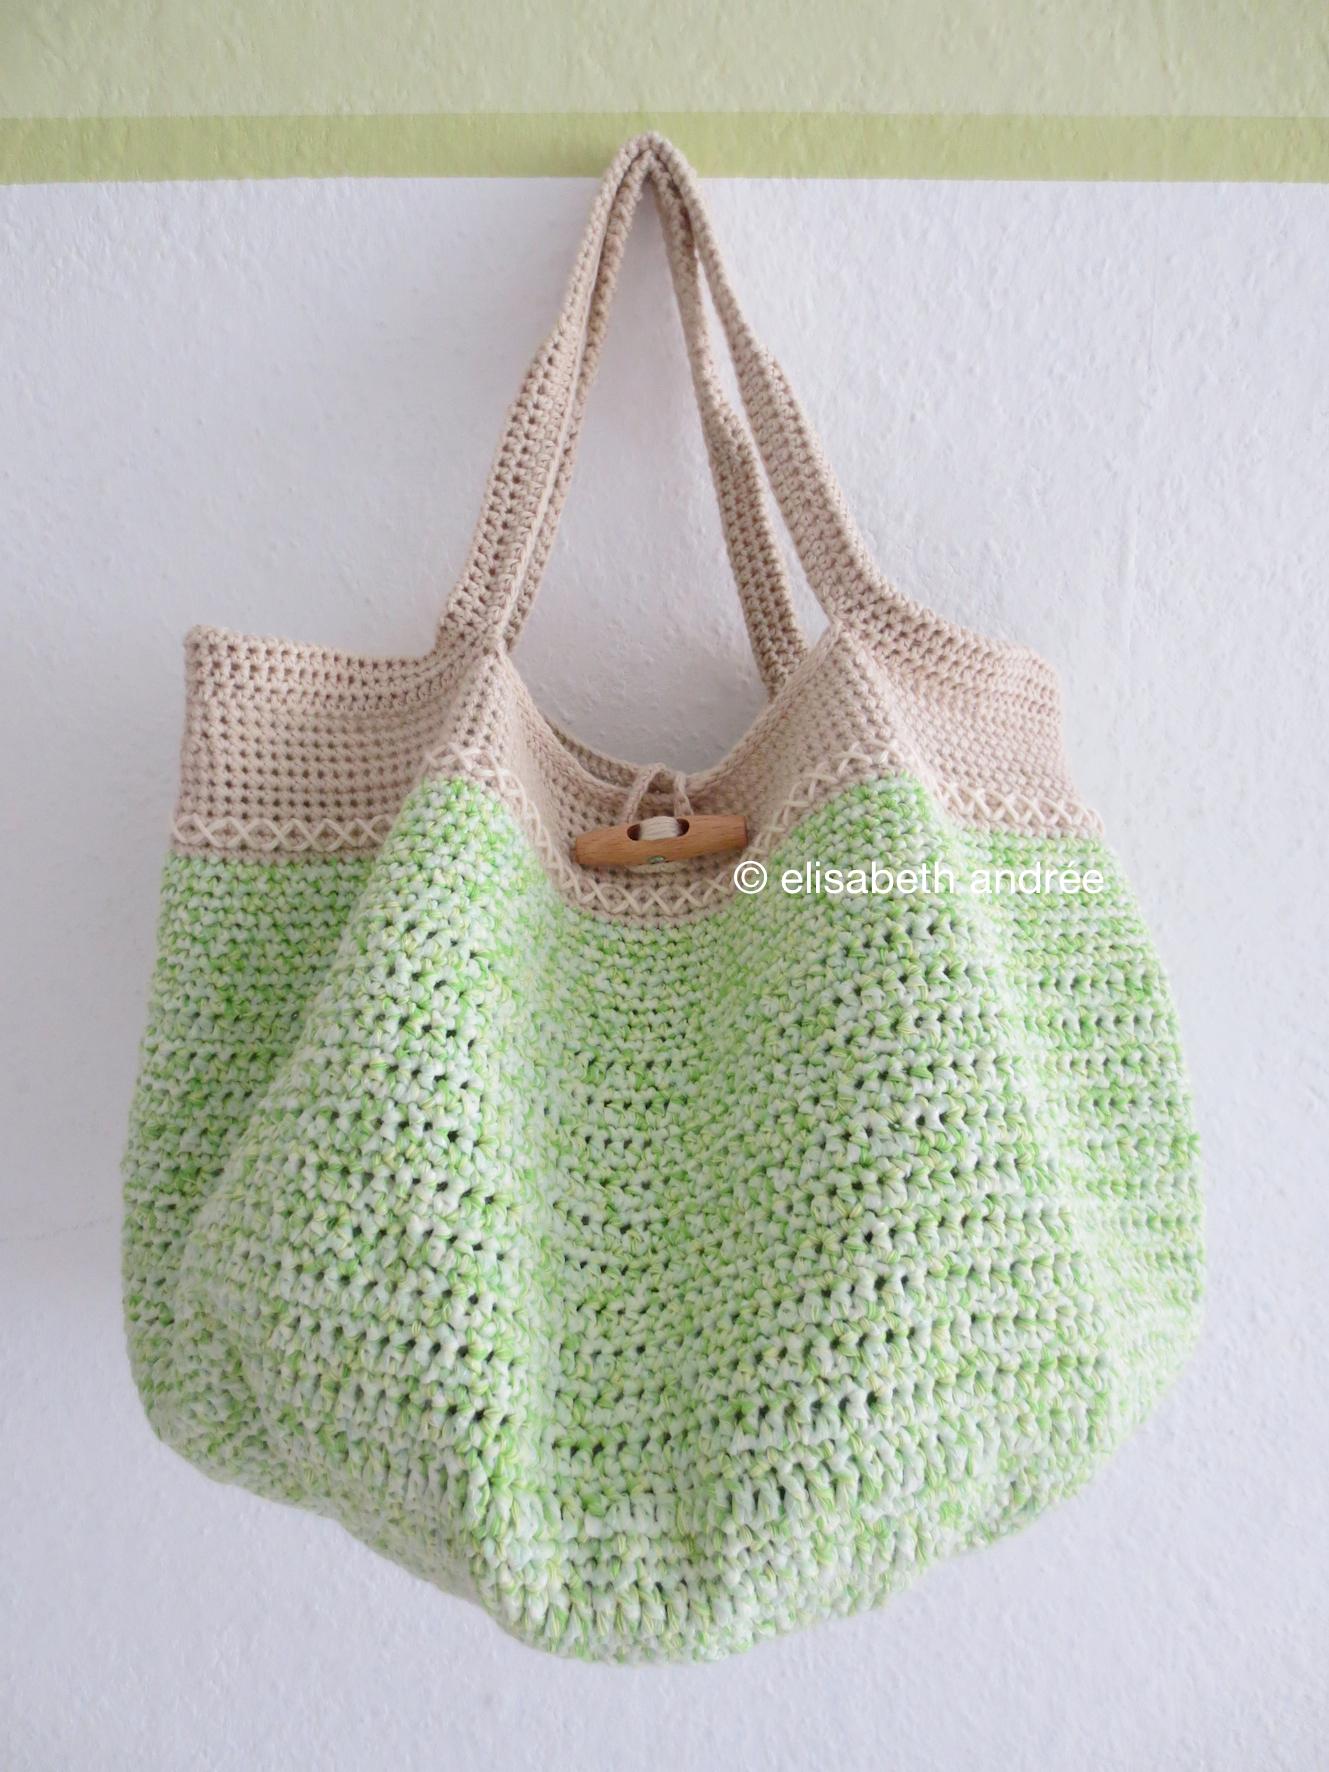 New Crochet Bags : crochet-spring-bag-by-elisabeth-andrc3a9e.jpg